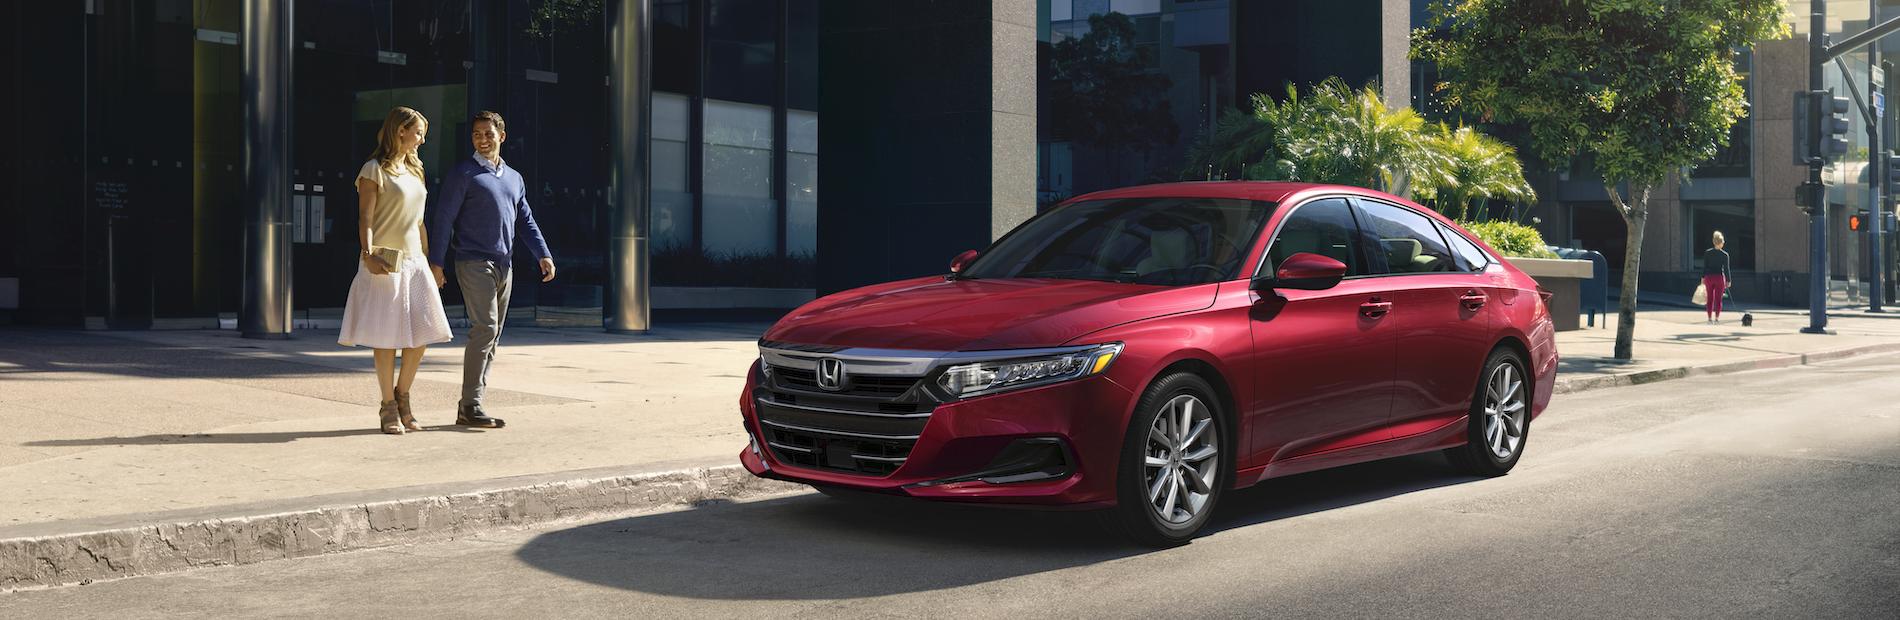 Honda Accord for Sale near San Marcos CA